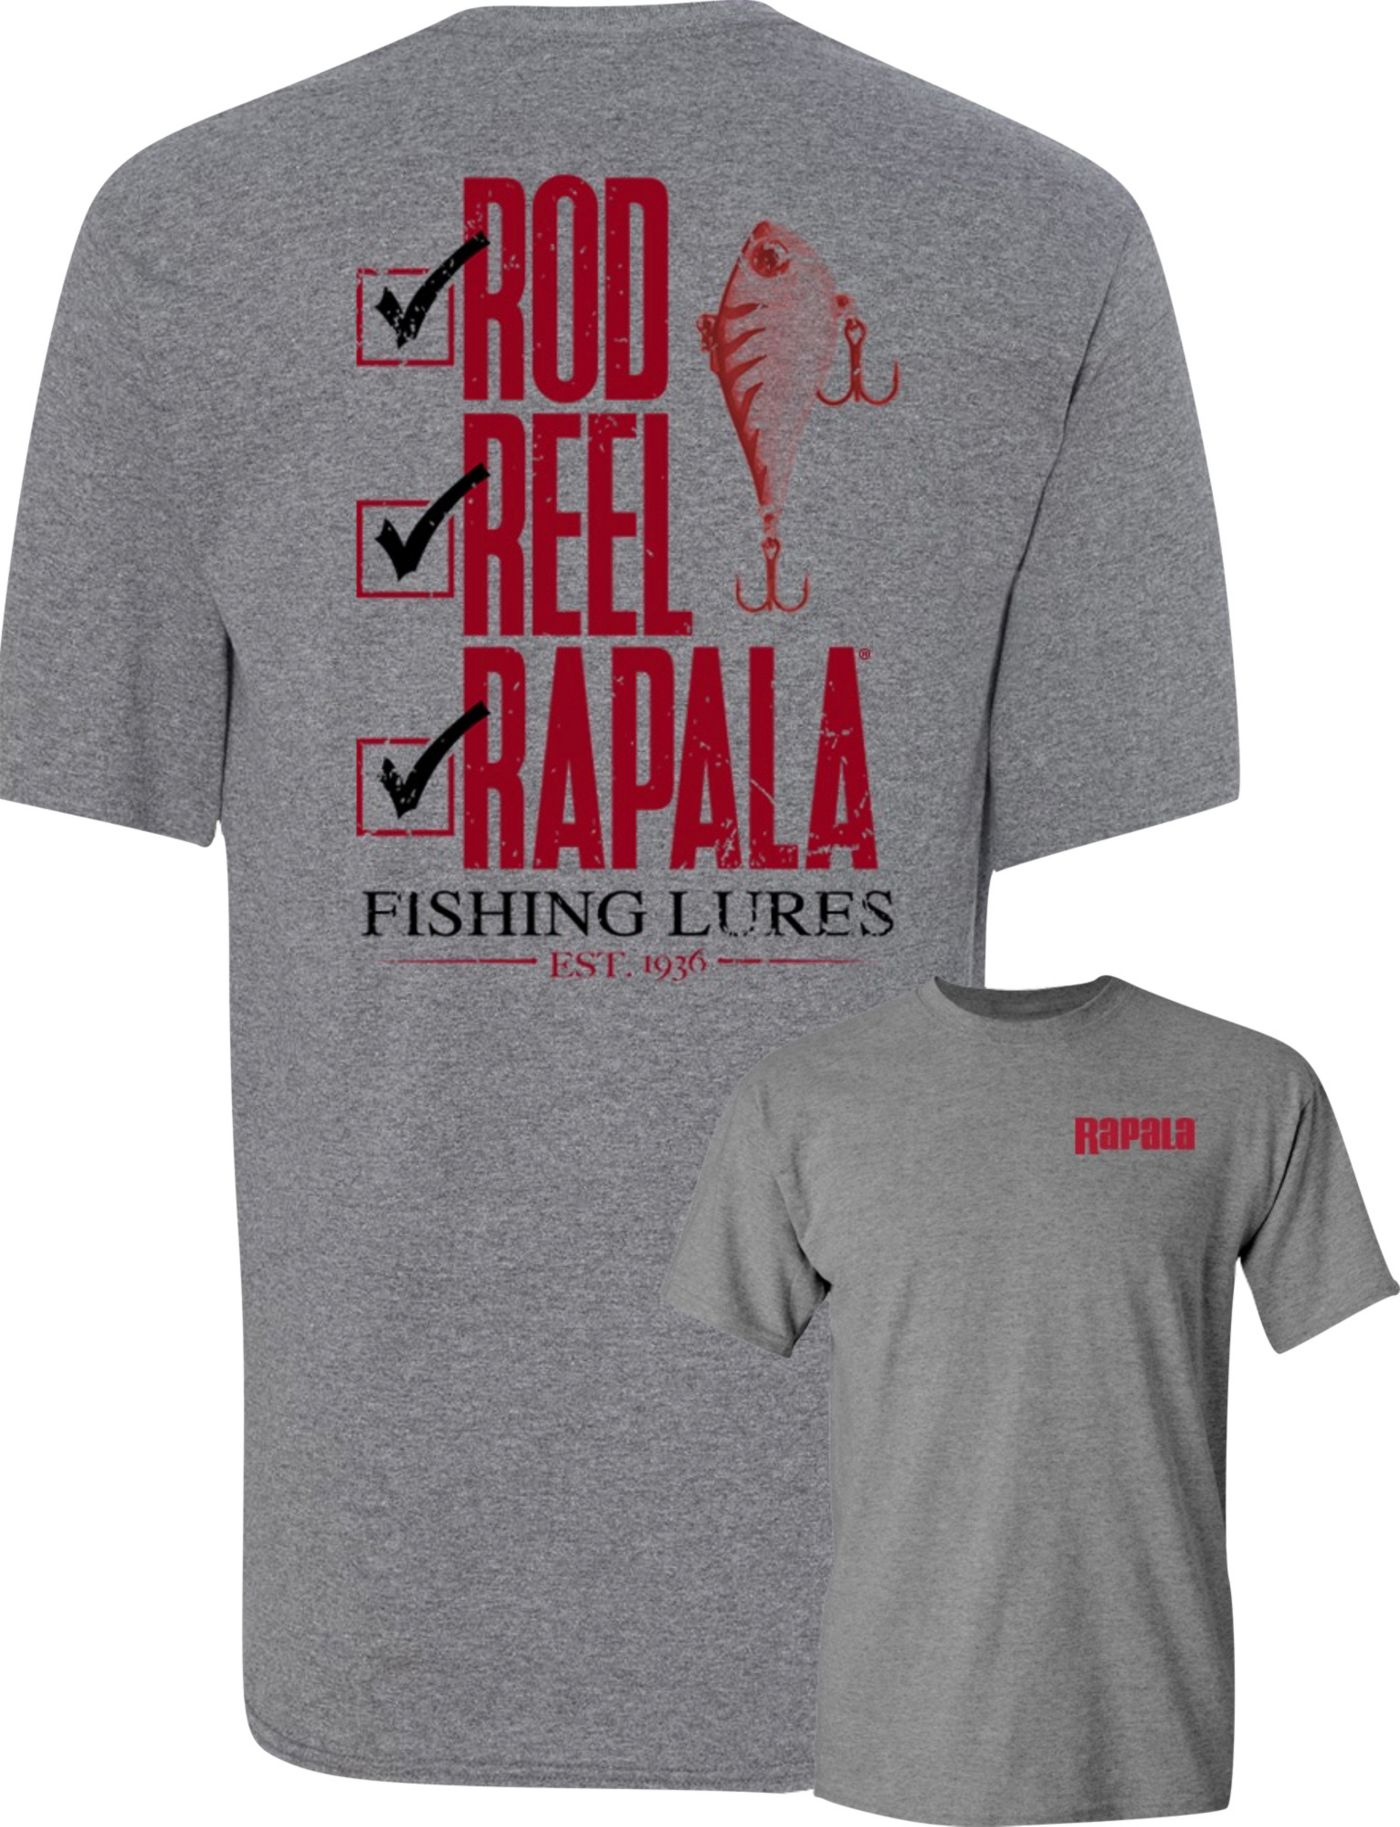 Rapala Men's Rod, Reel, Rapala T-Shirt